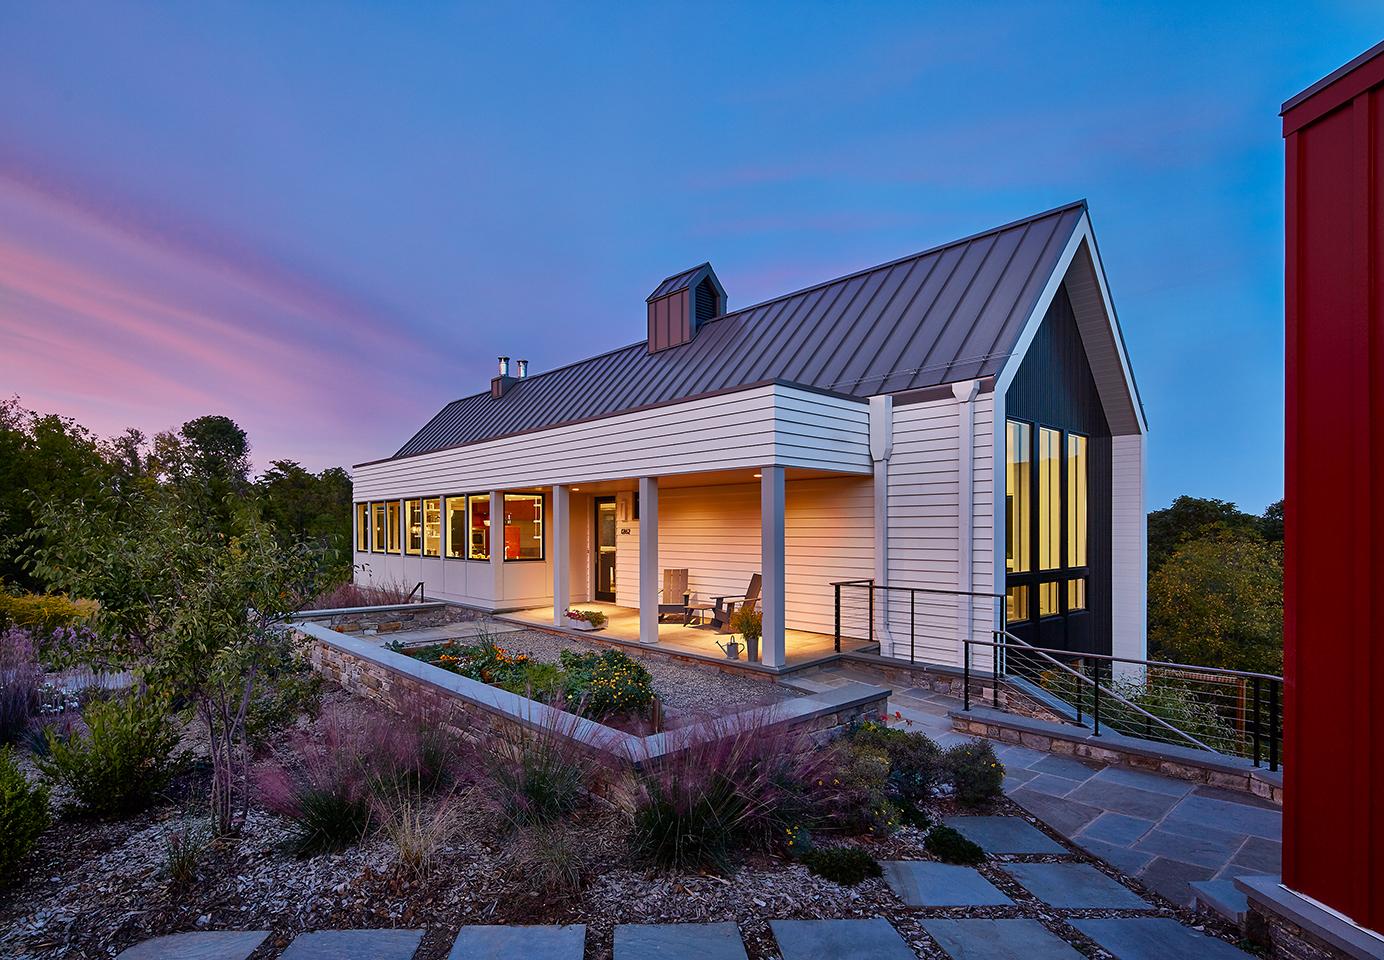 New House Design Photos: Modern Retreat In A Rural Hamlet : WIEDEMANN ARCHITECTS